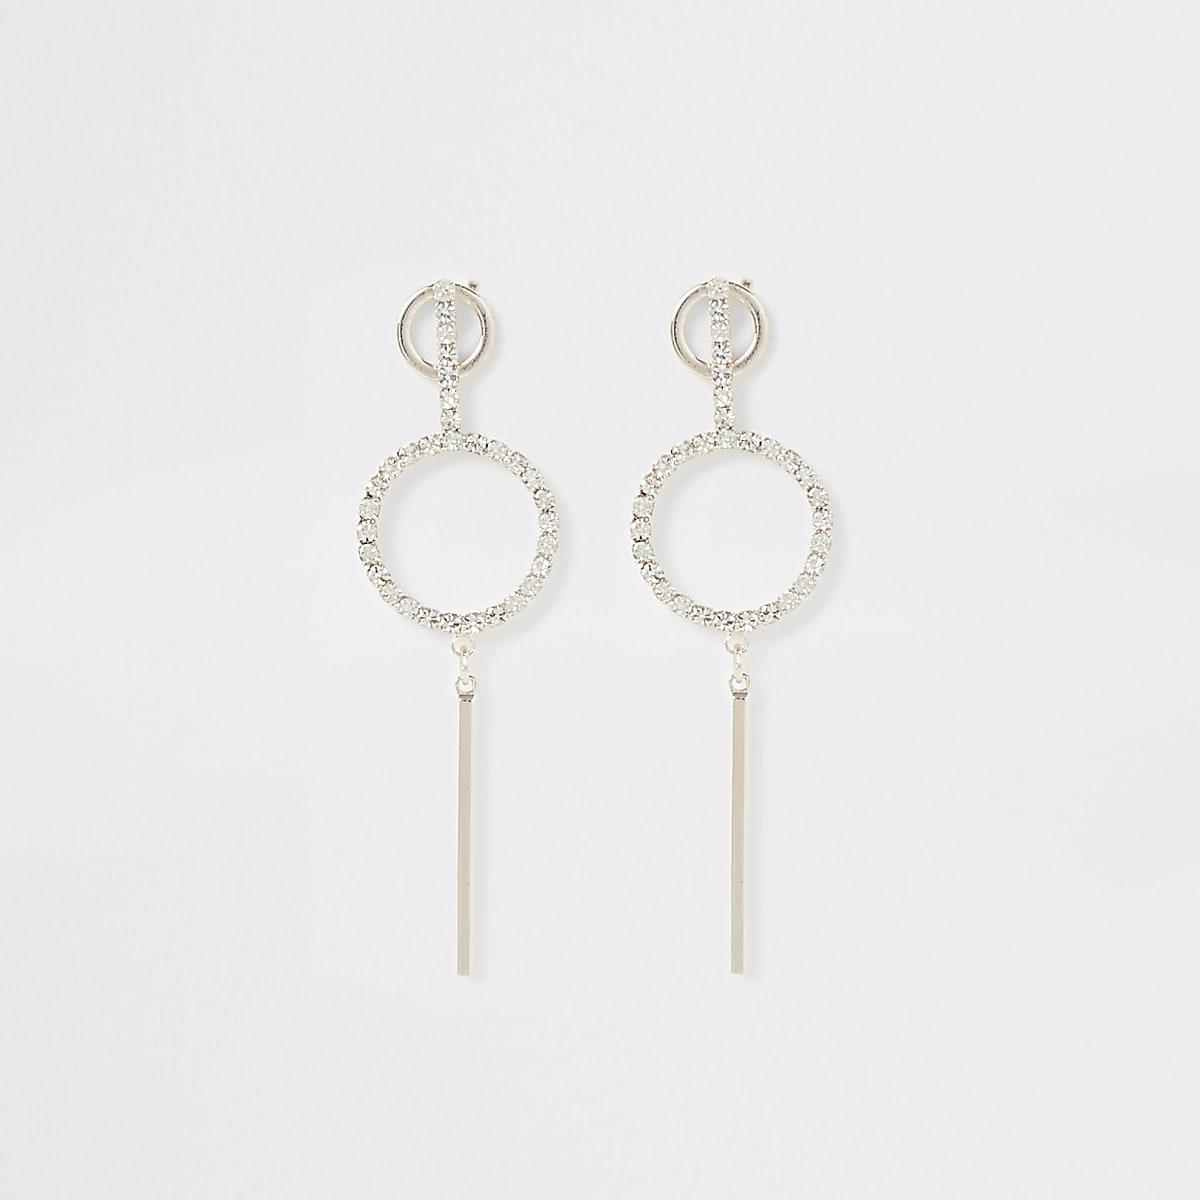 Rose gold rhinestone pave ring bar earrings